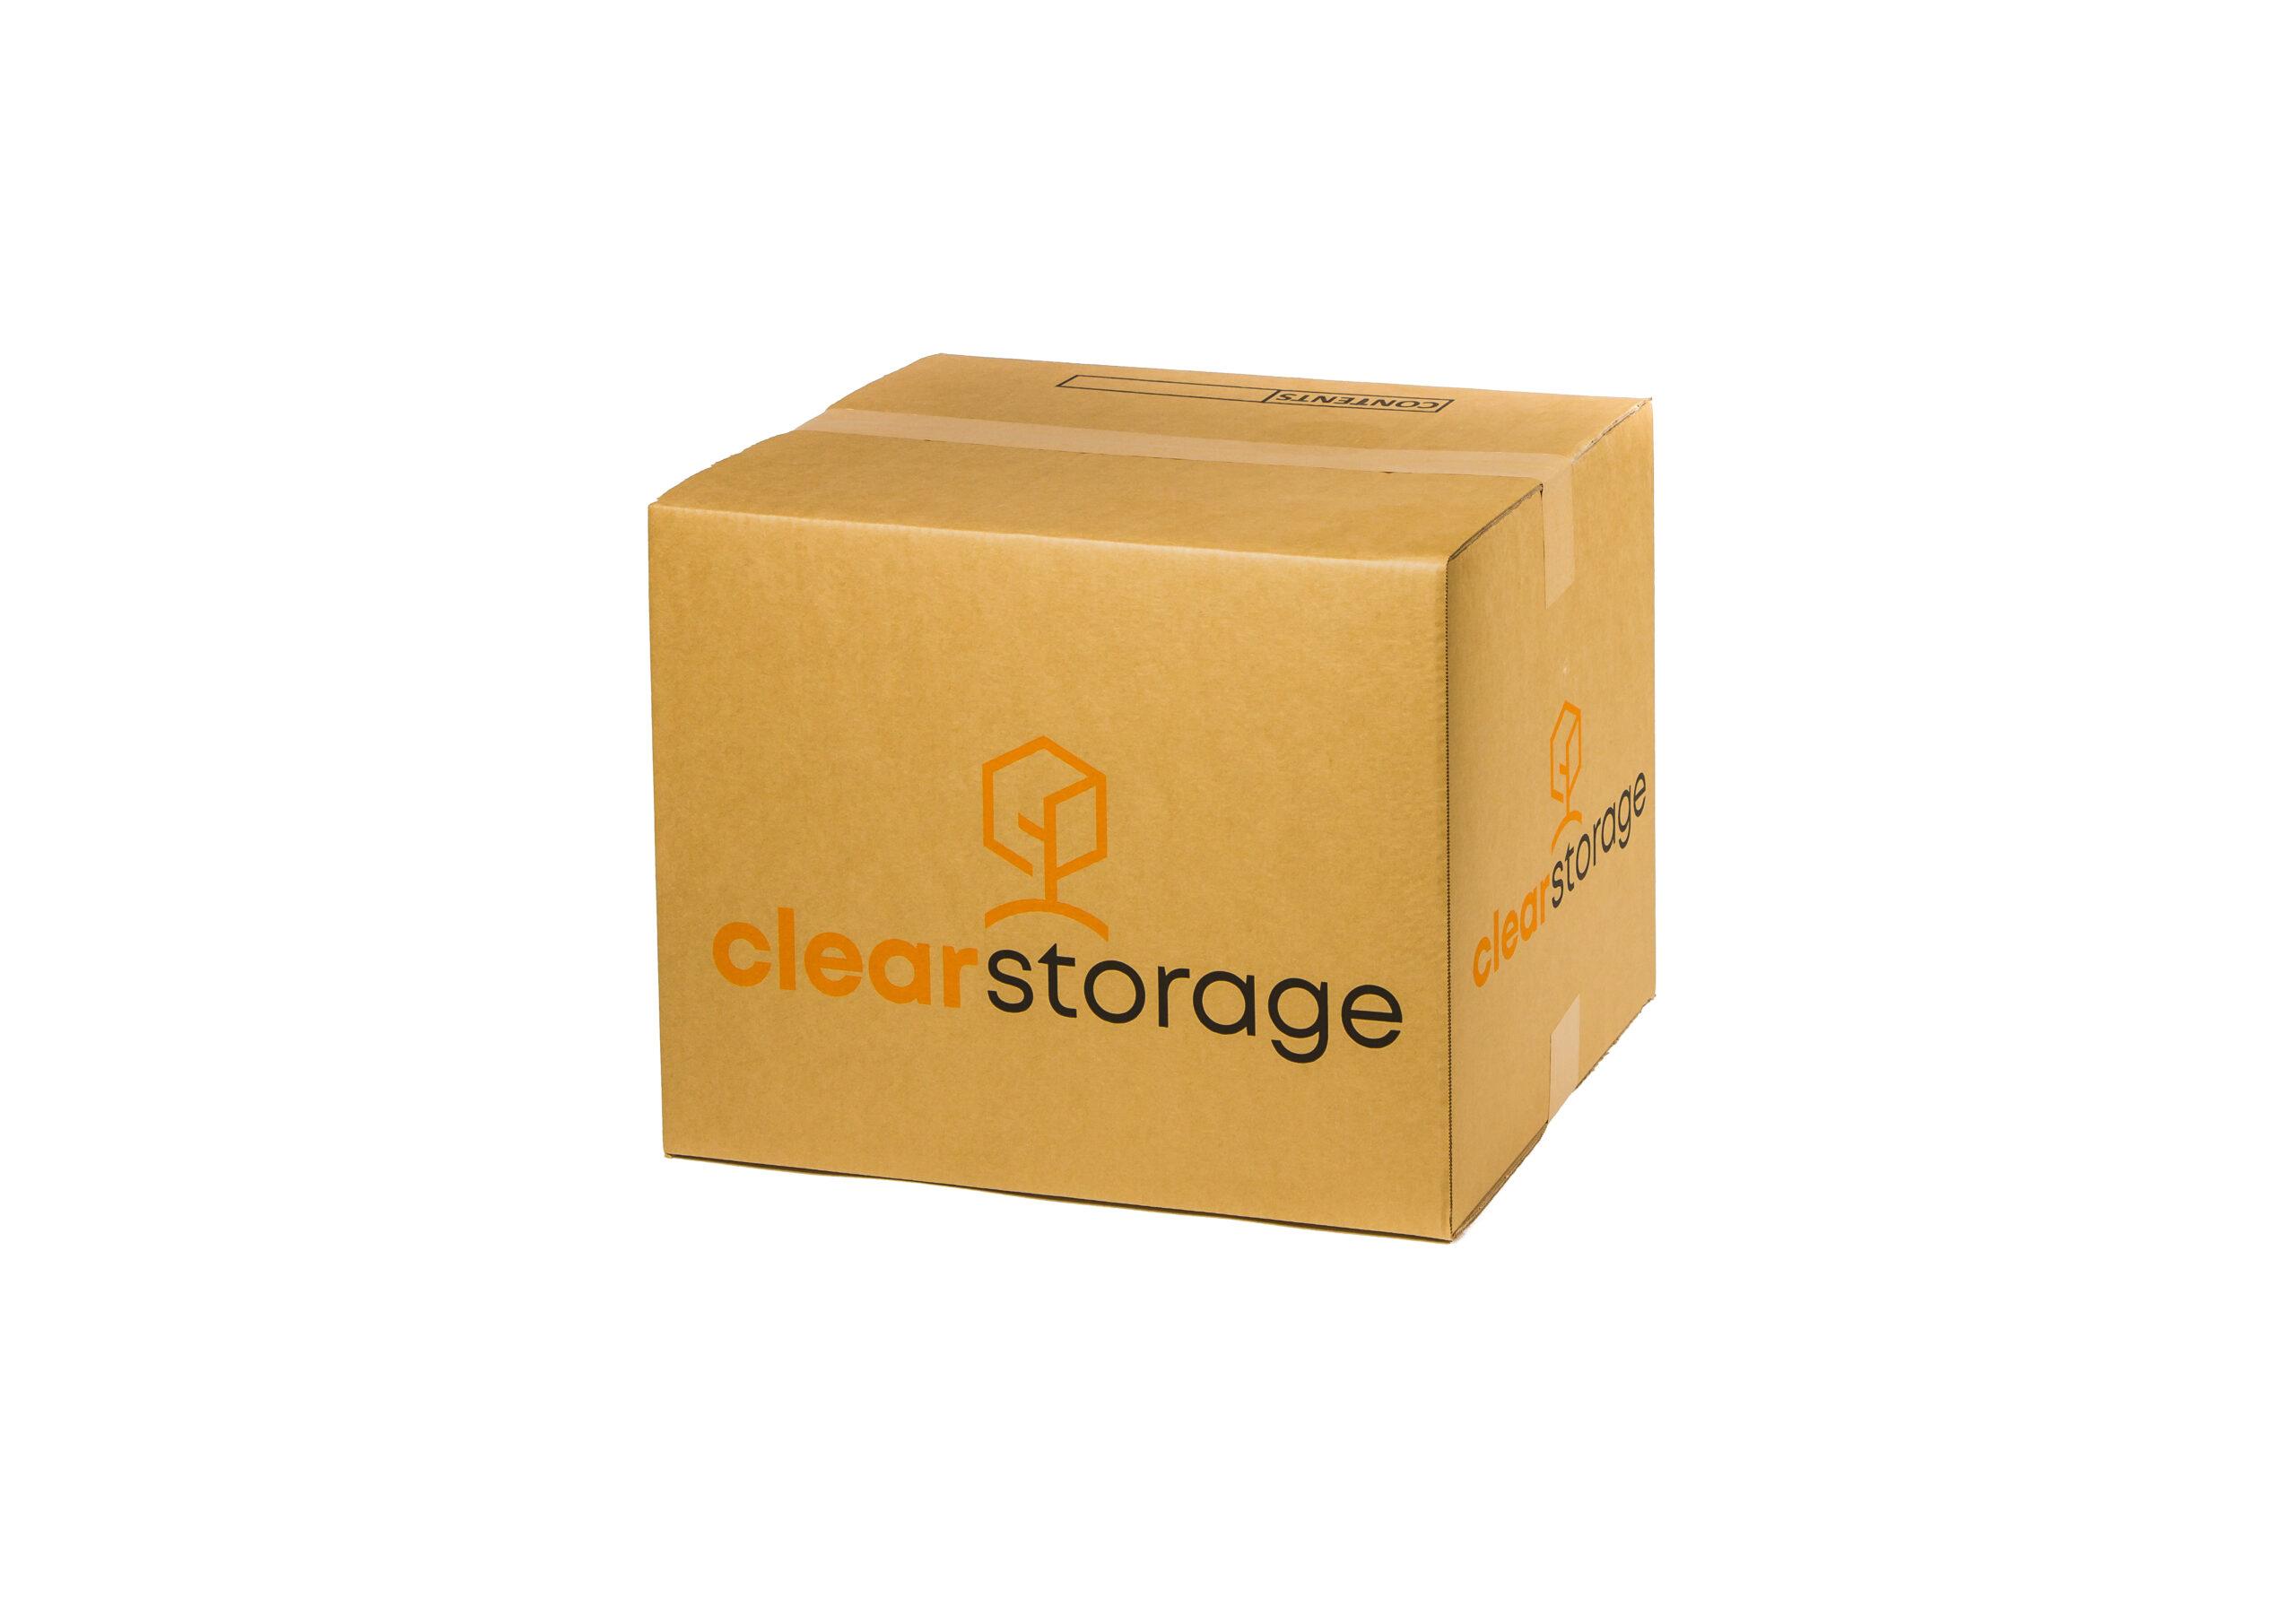 Medium box - Clear Storage Packaging